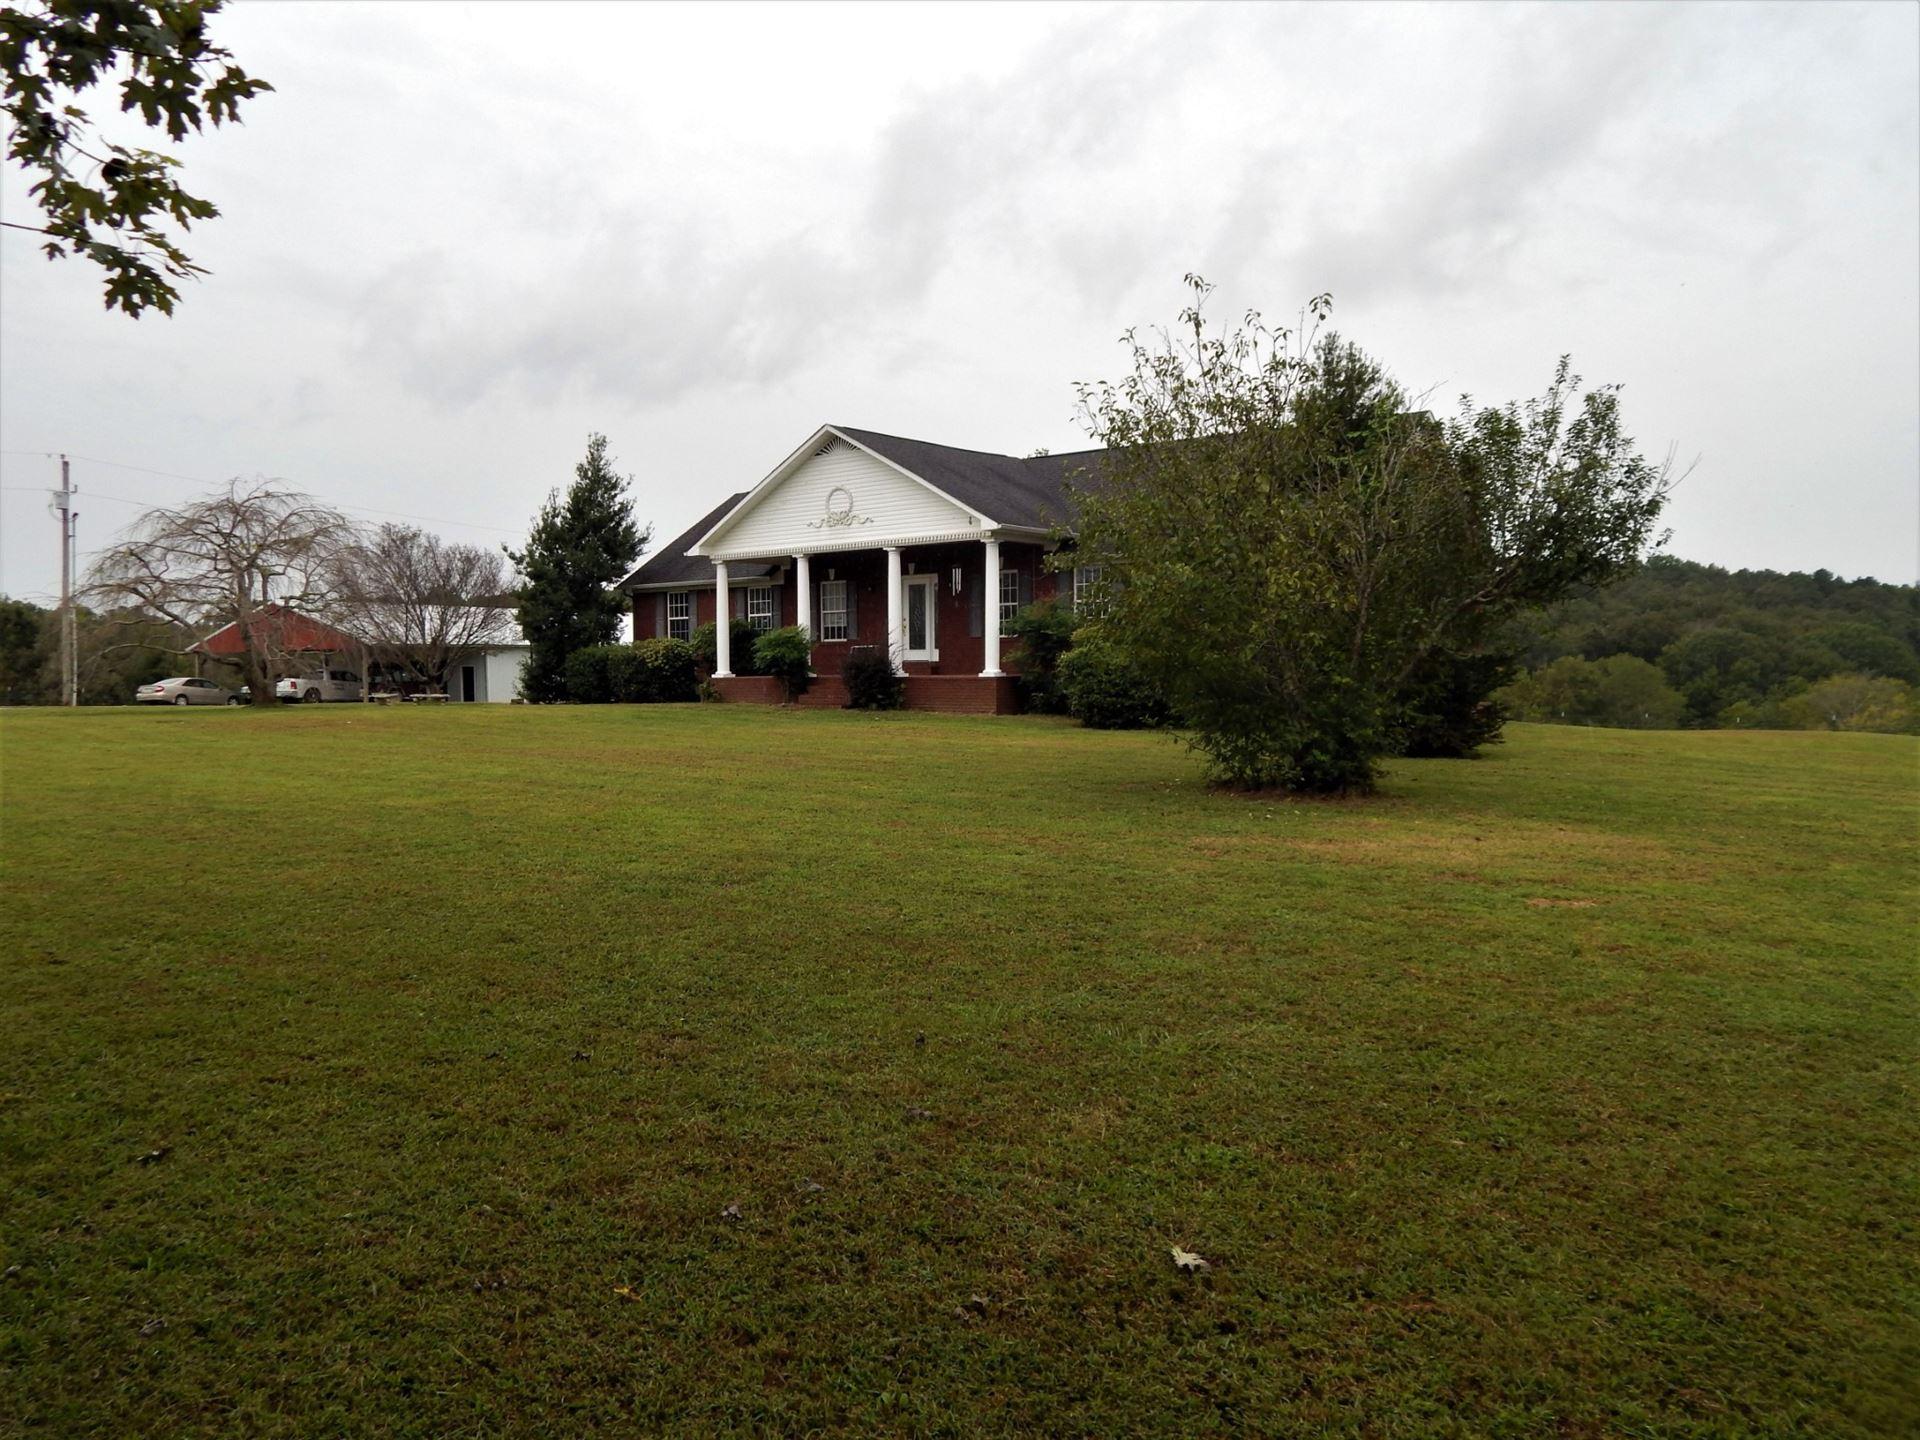 Photo of 285 Senator Cobb Rd, Clifton, TN 38425 (MLS # 2192778)